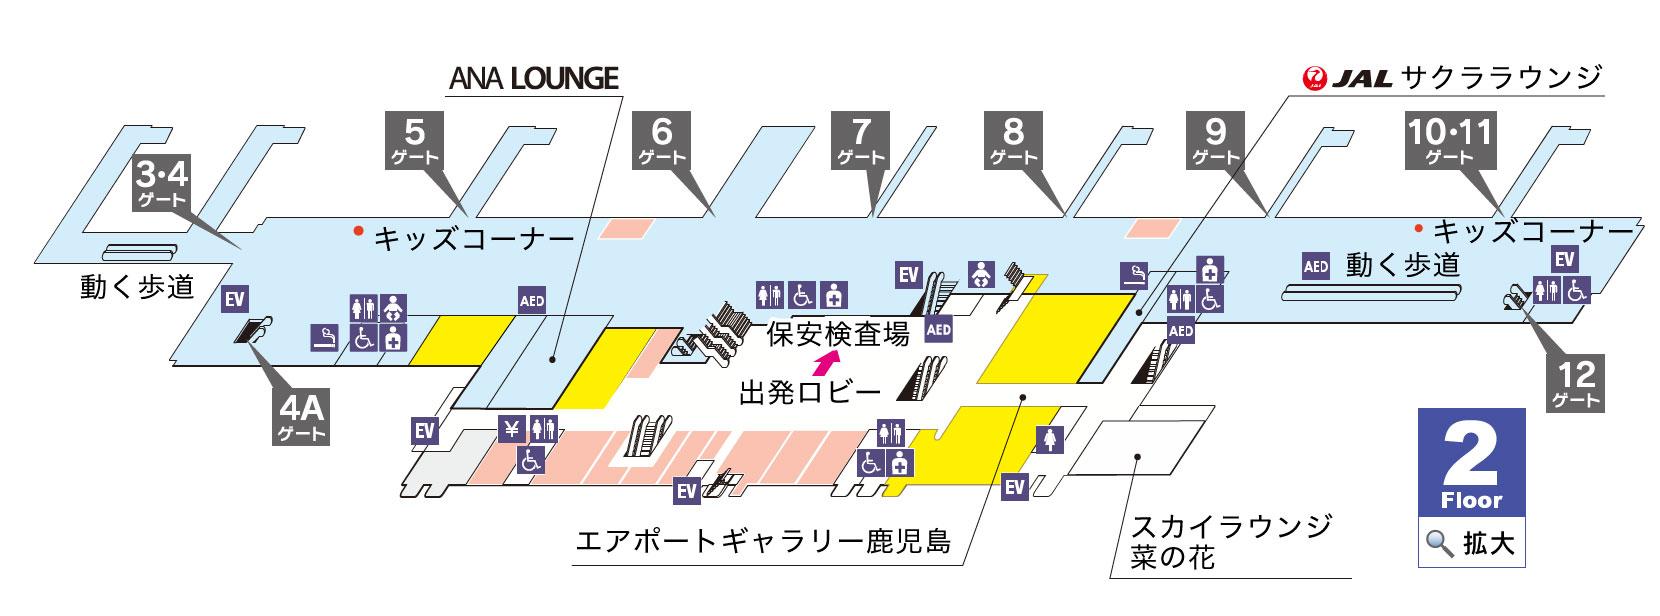 skylounge_nanohana_map